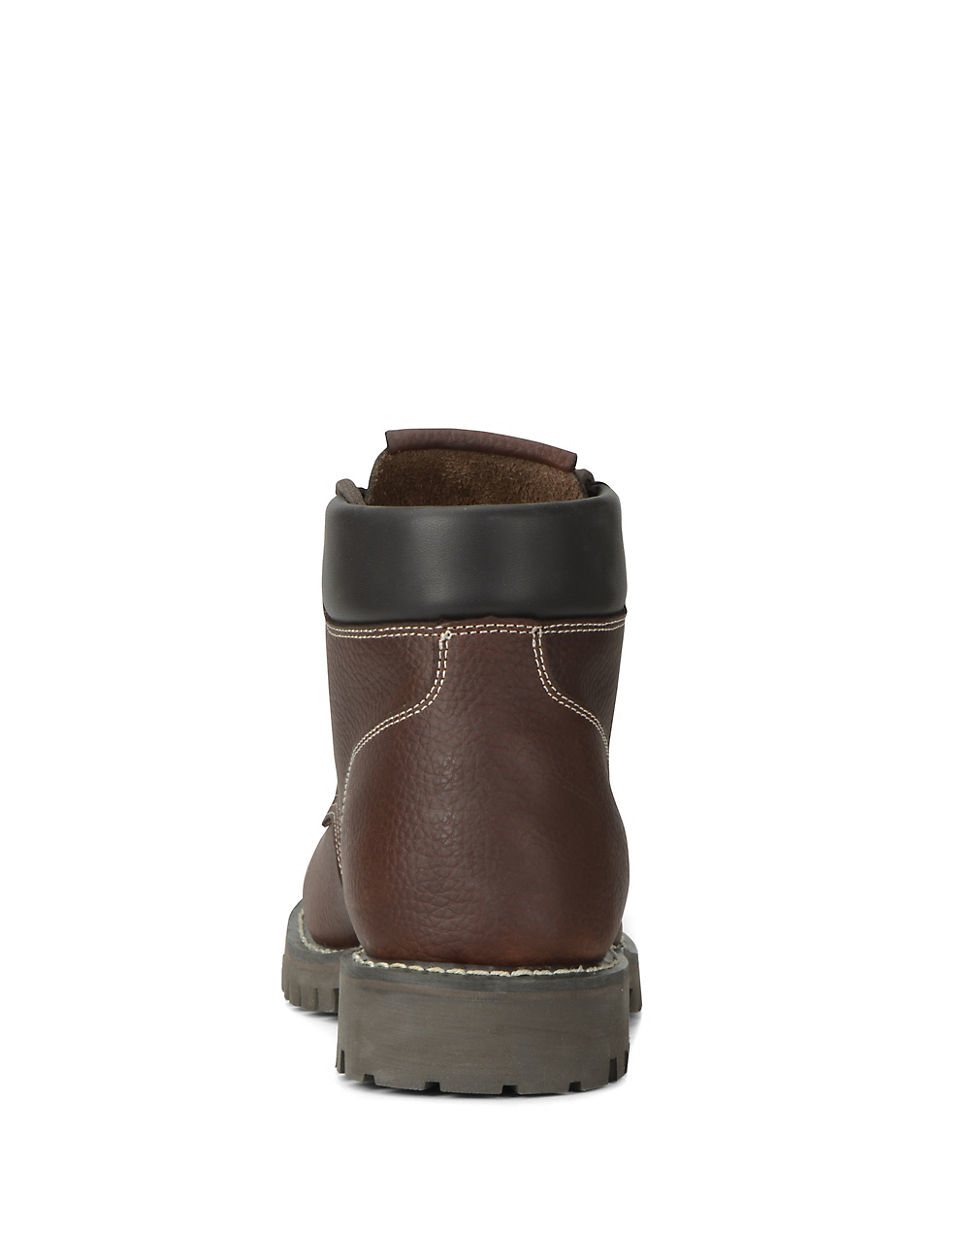 Dr Zhibago Leather Shoes